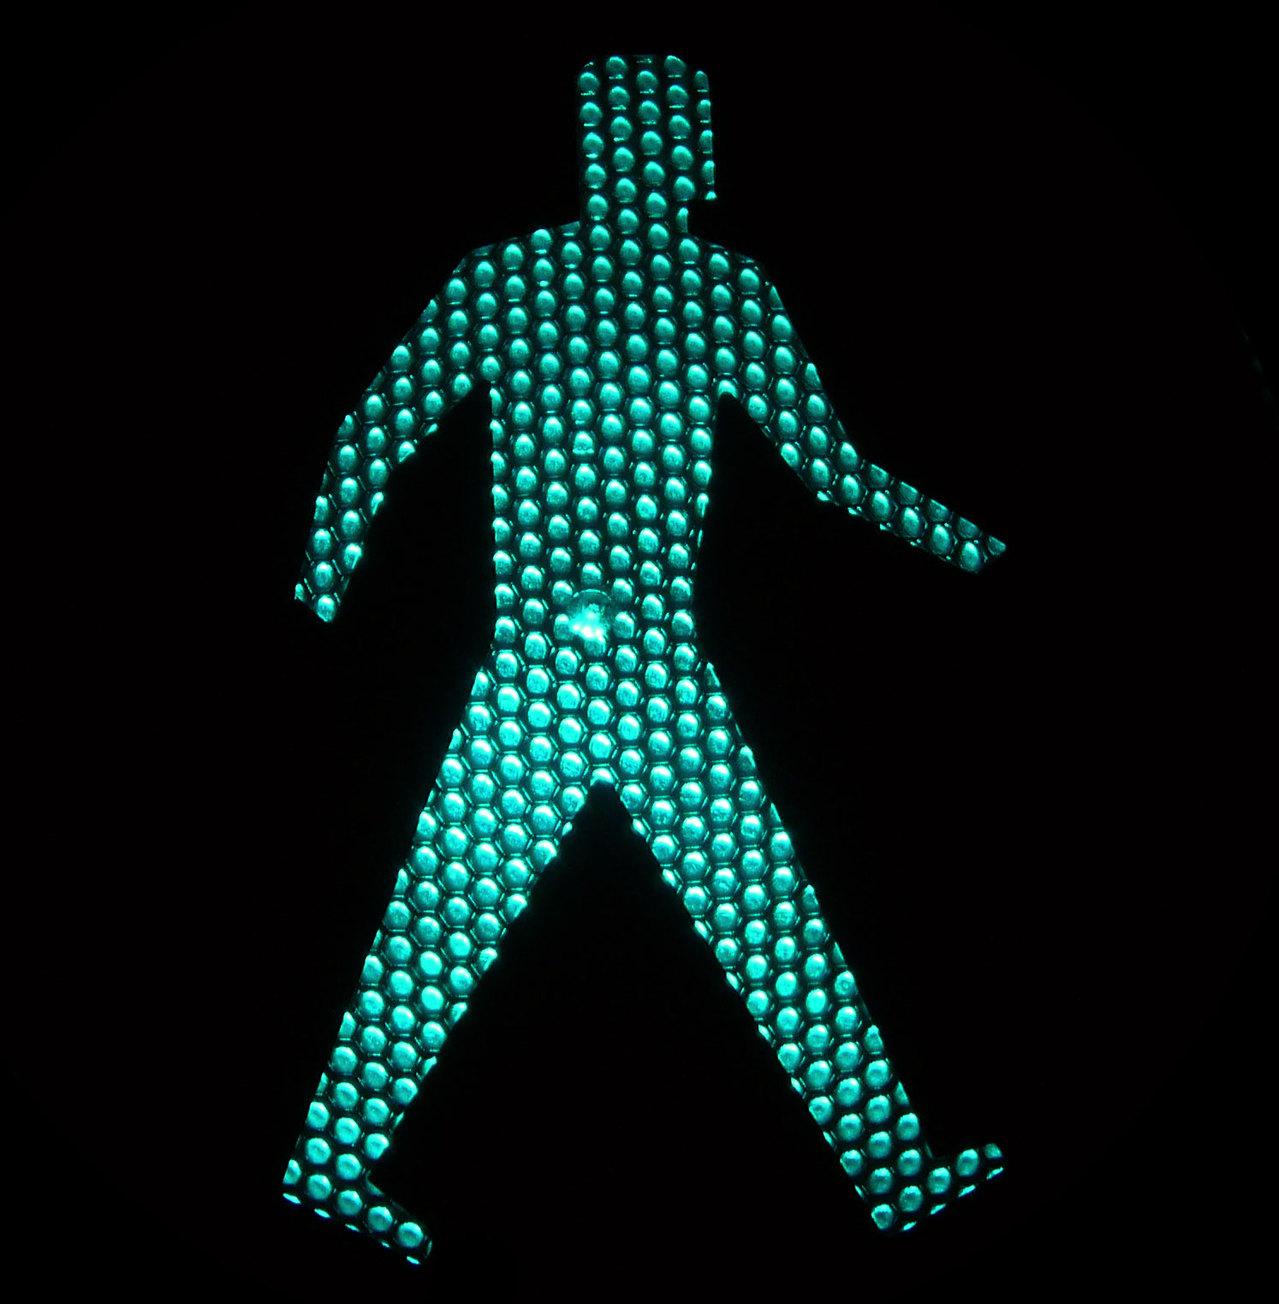 11_AAA-traffic-light-figure-